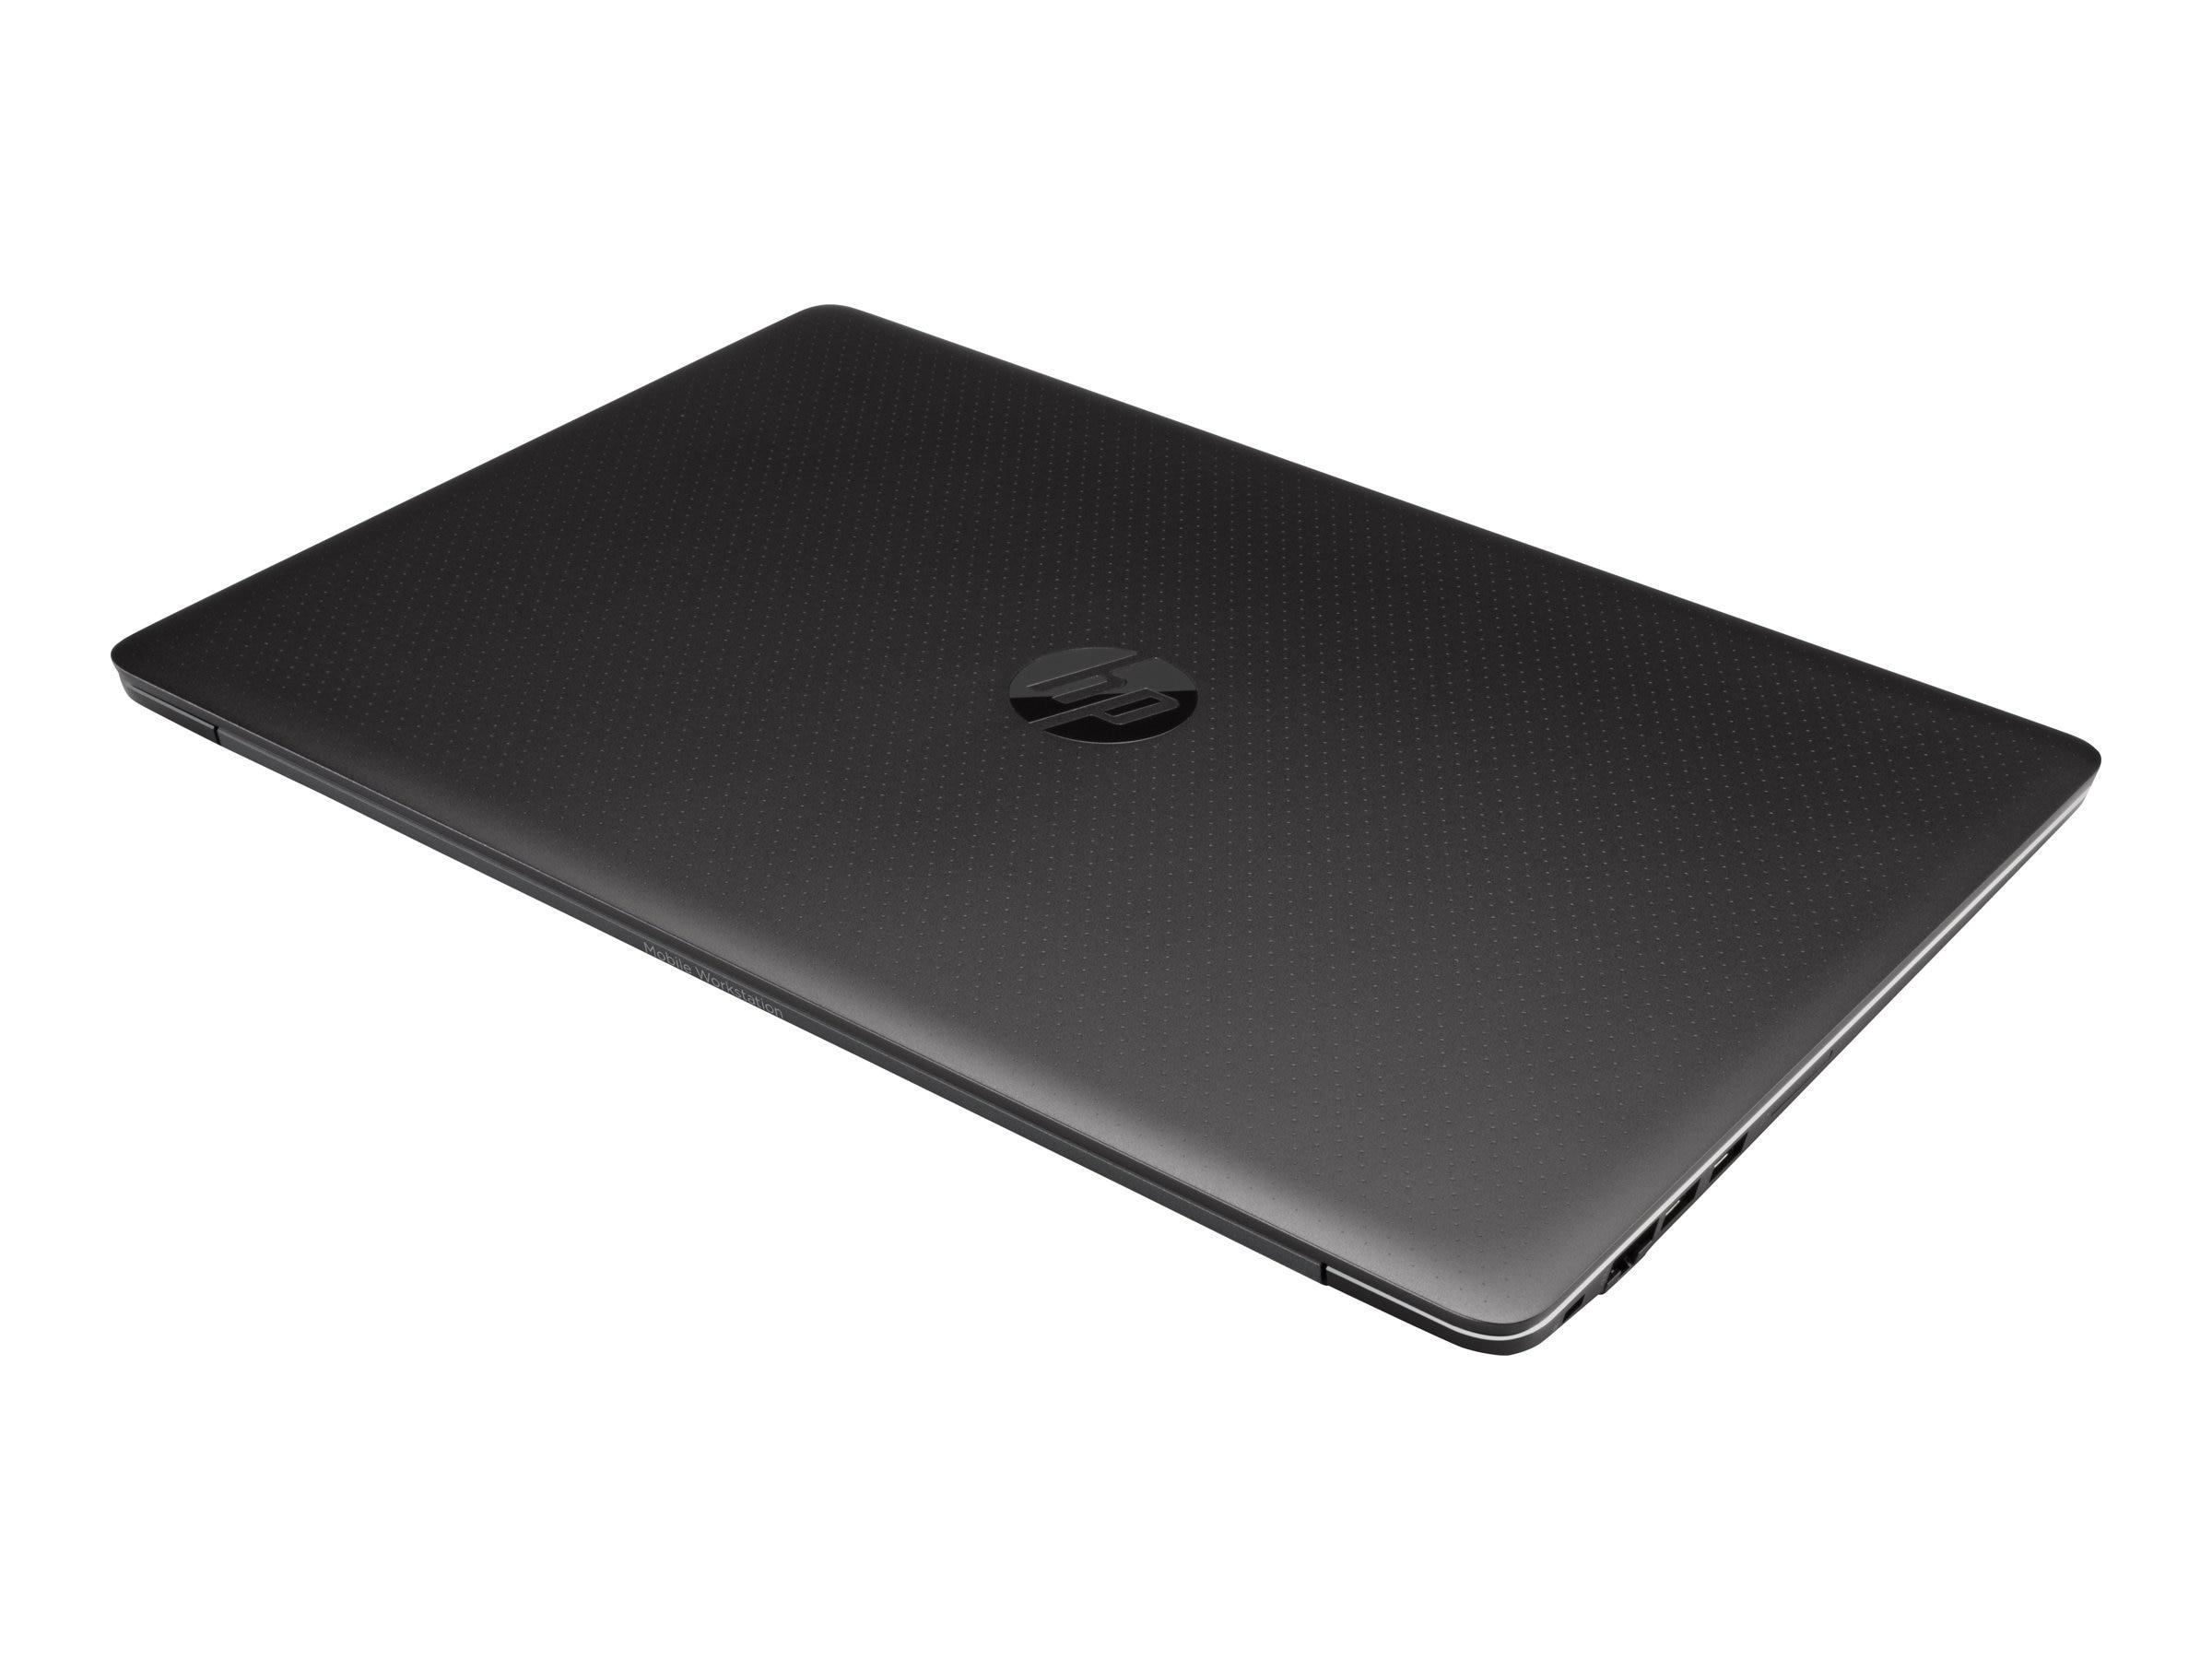 HP ZBook Studio G3 Xeon E3-1505M v5 2 8GHz 16GB 512GB SSD ac BT FR M1000M  15 6